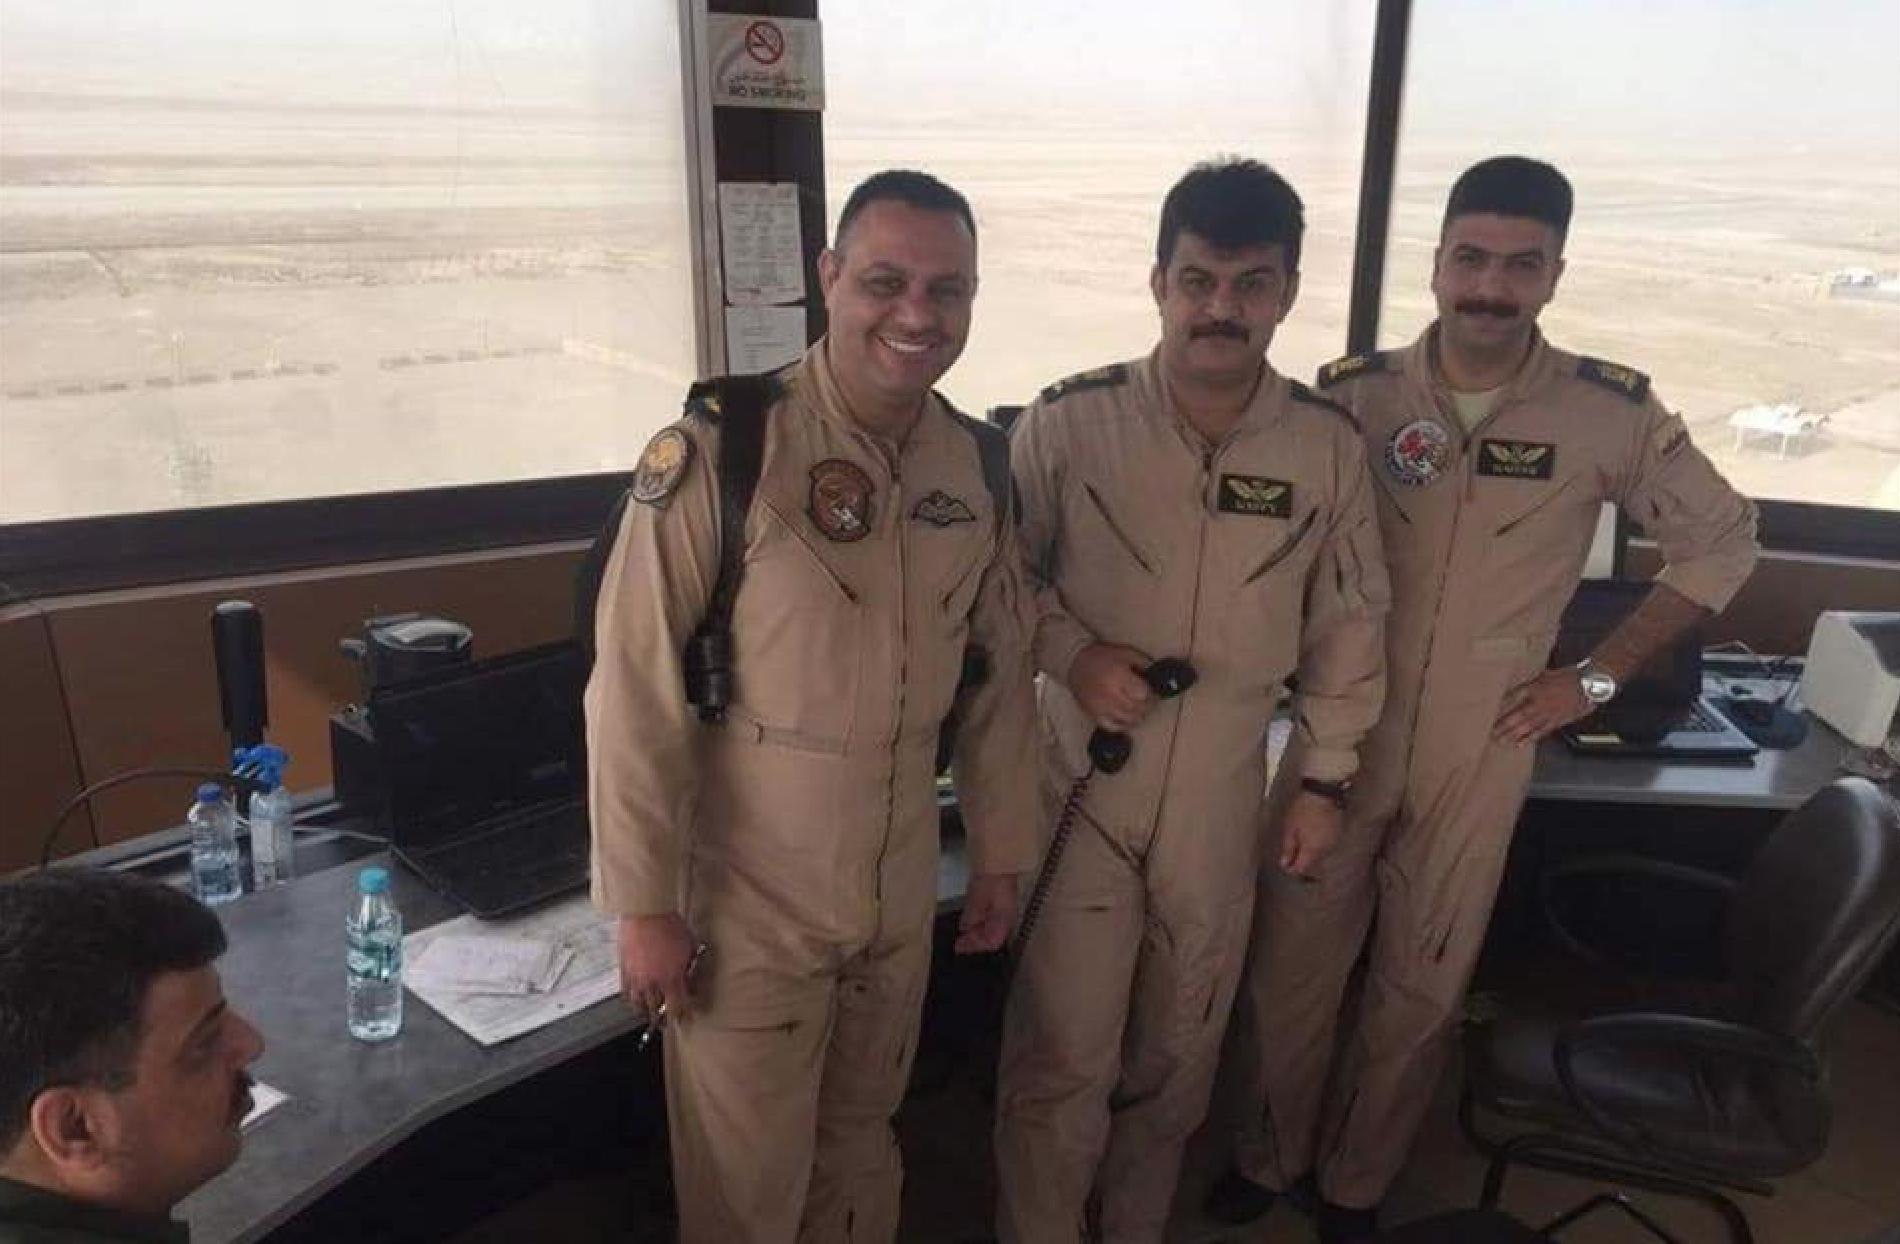 Iraq ATC strike – update